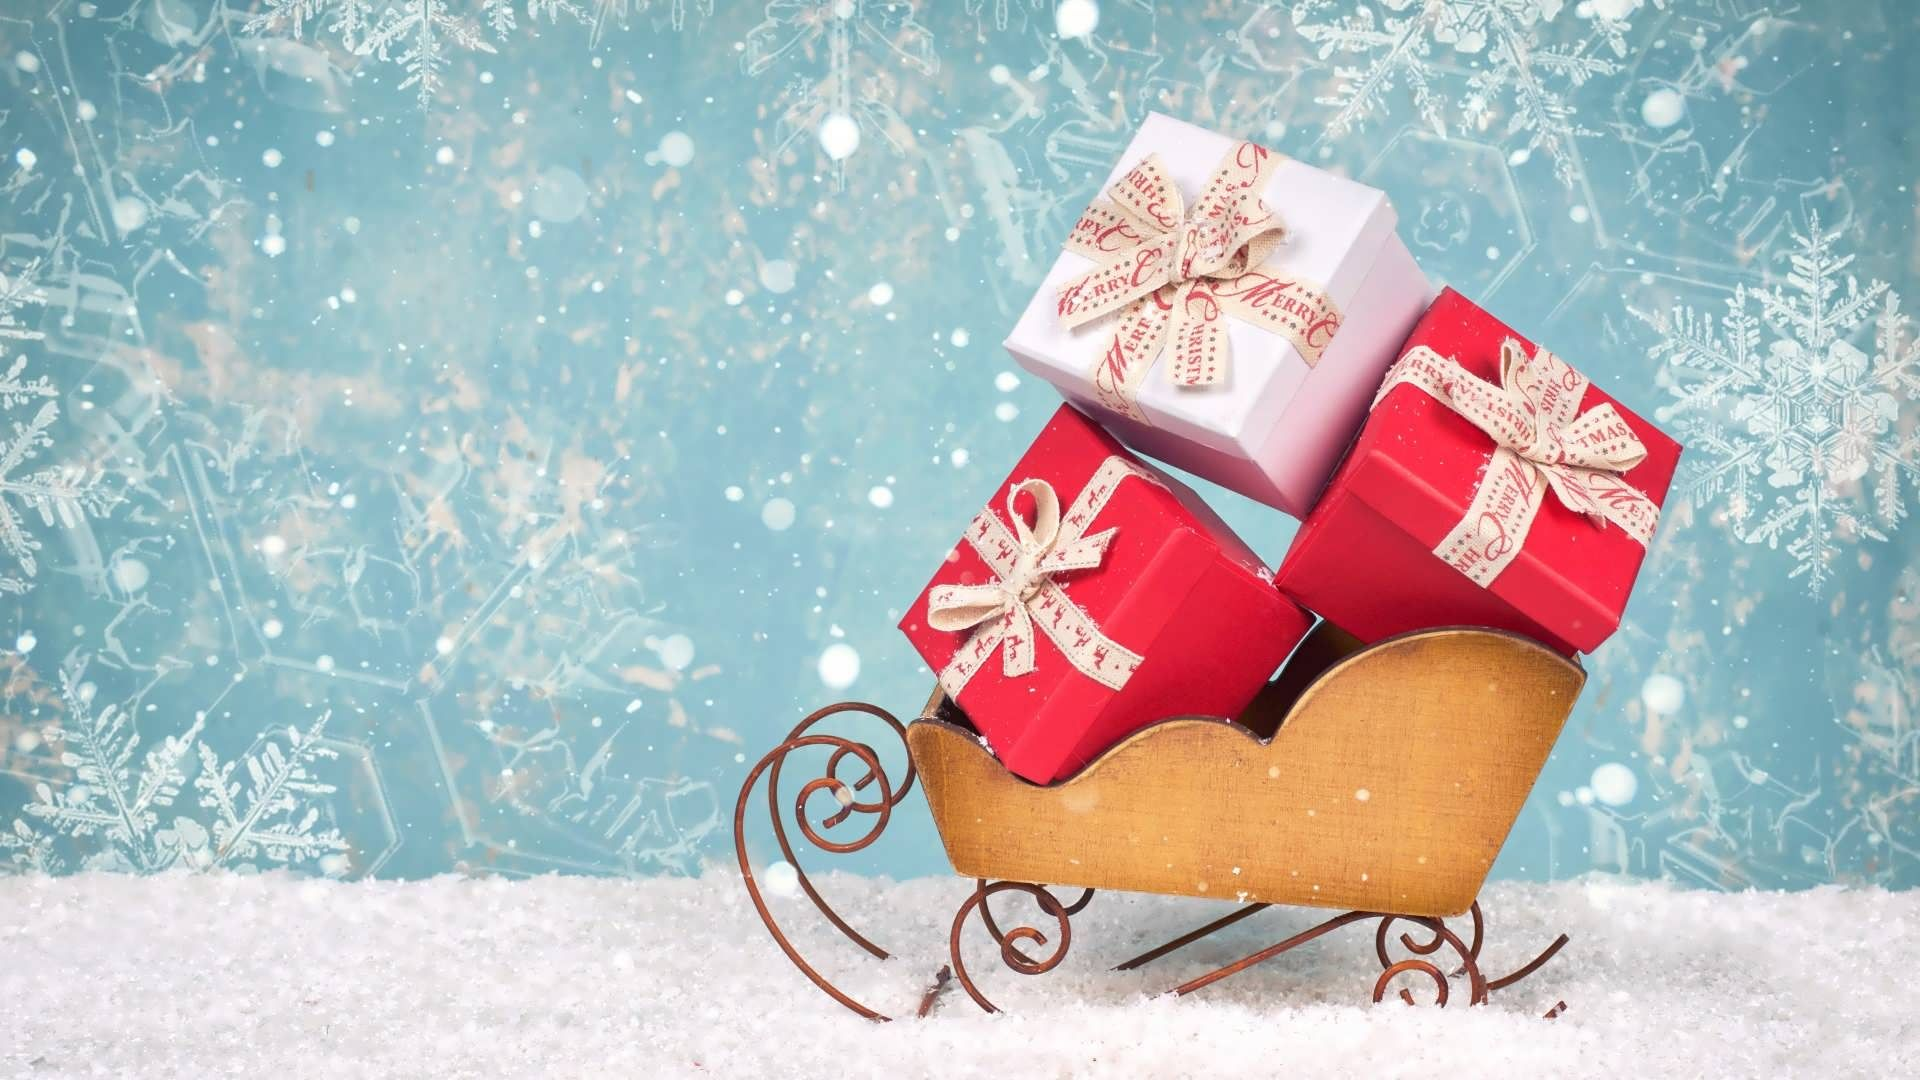 Christmas Sleigh 1080p Wallpaper